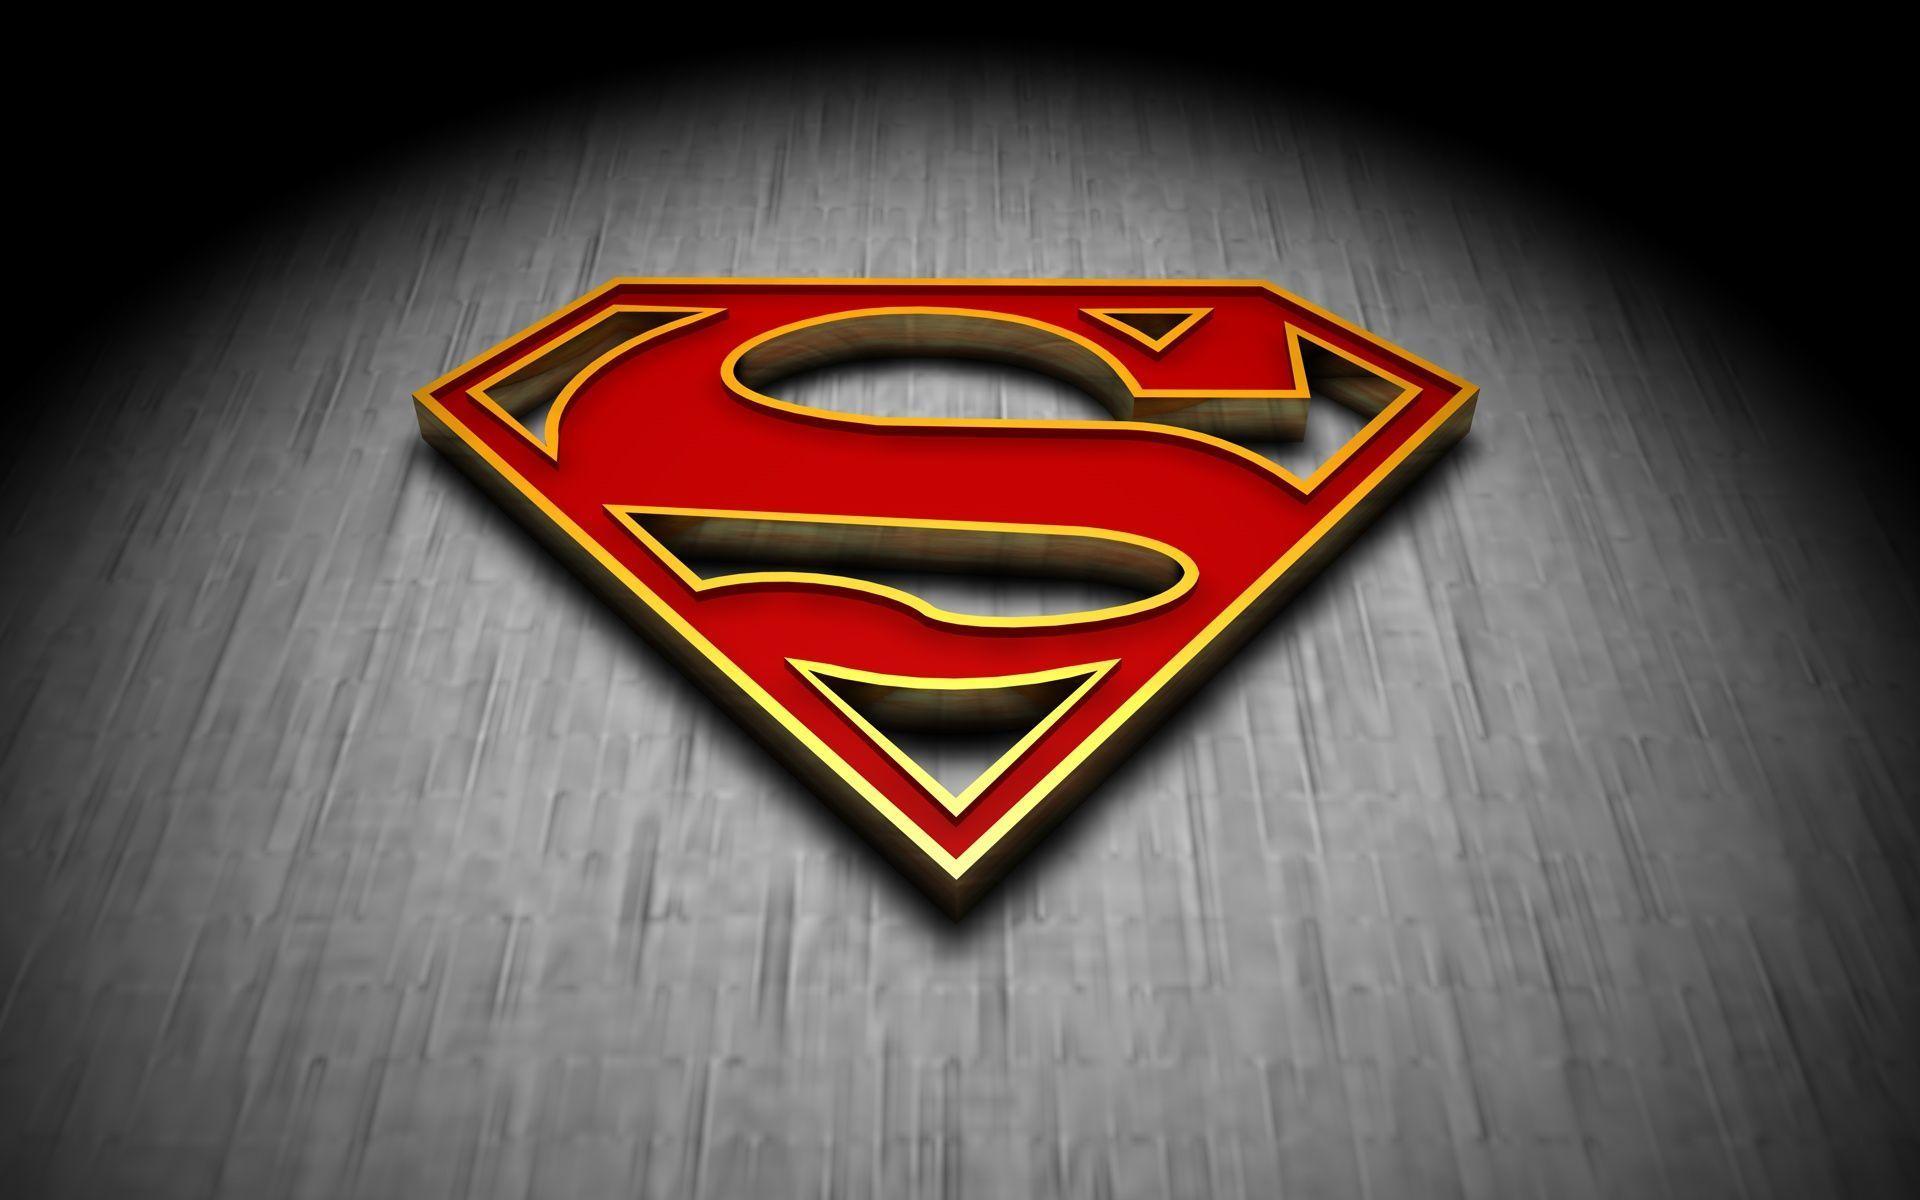 Superman logo wallpaper hd 640960 superman logo wallpaper superman logo wallpaper hd 640960 superman logo wallpaper adorable wallpapers buycottarizona Gallery